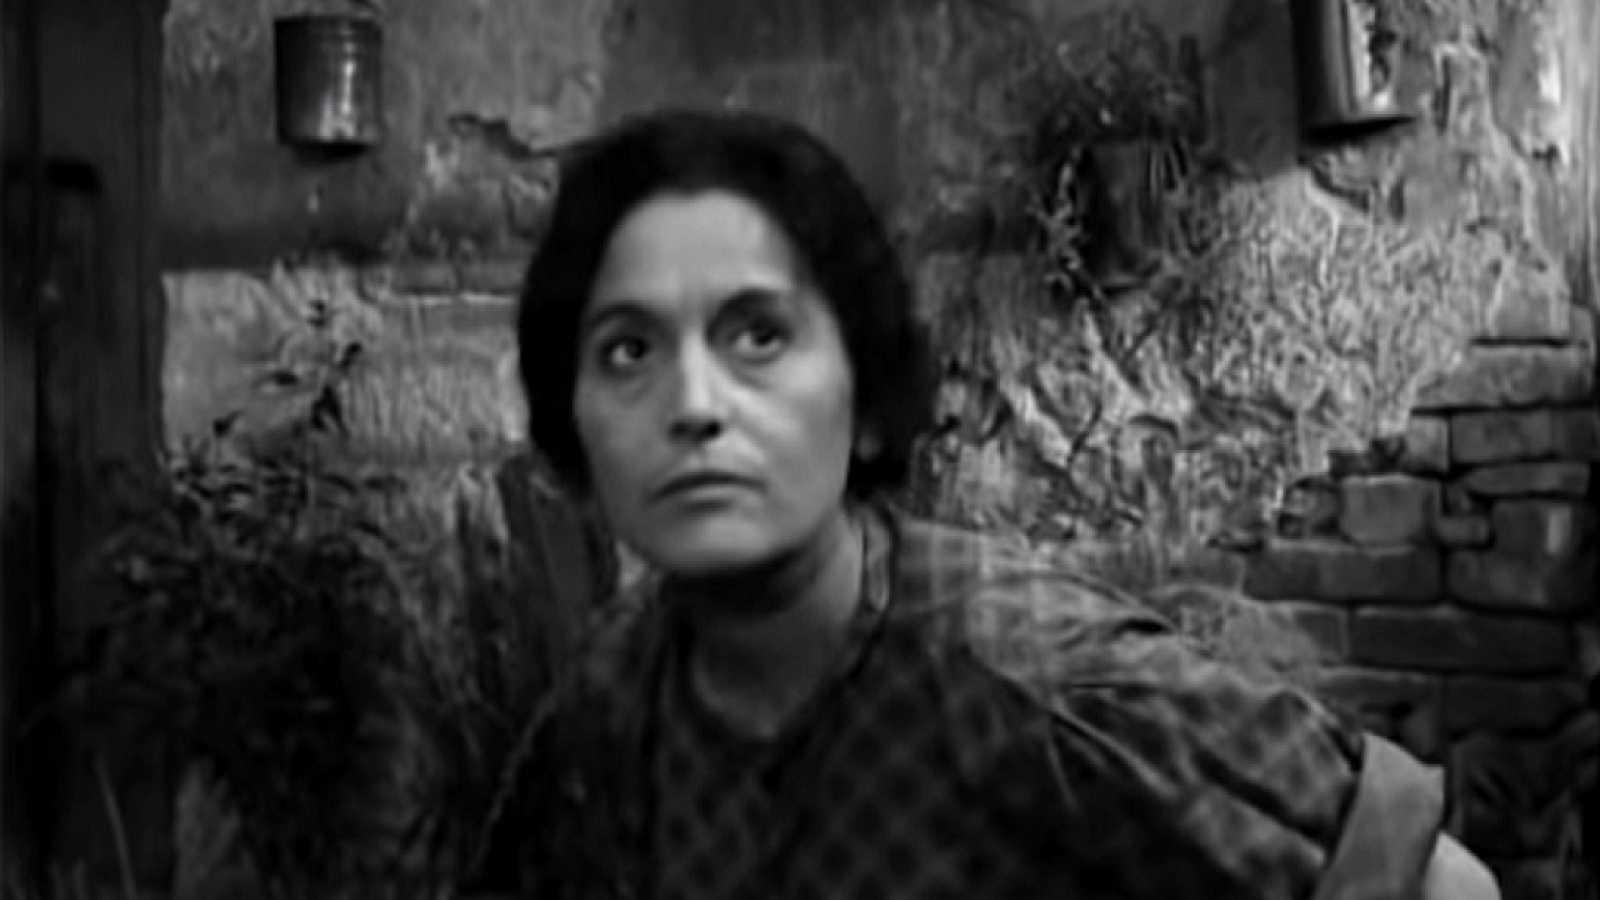 LiterCast - La tía Chanfaina (Benito Pérez Galdós) - 20/12/14 - Escuchar ahora